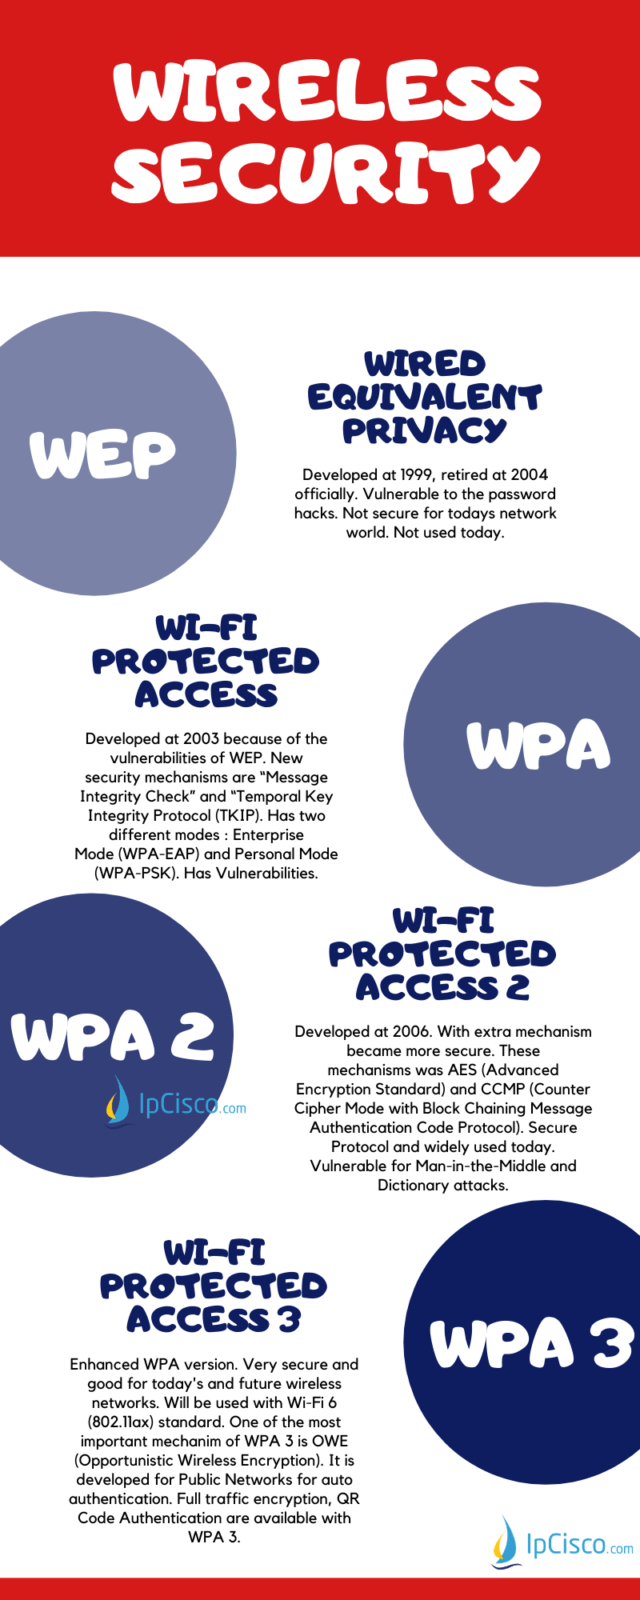 wireless-security-protocols-pin